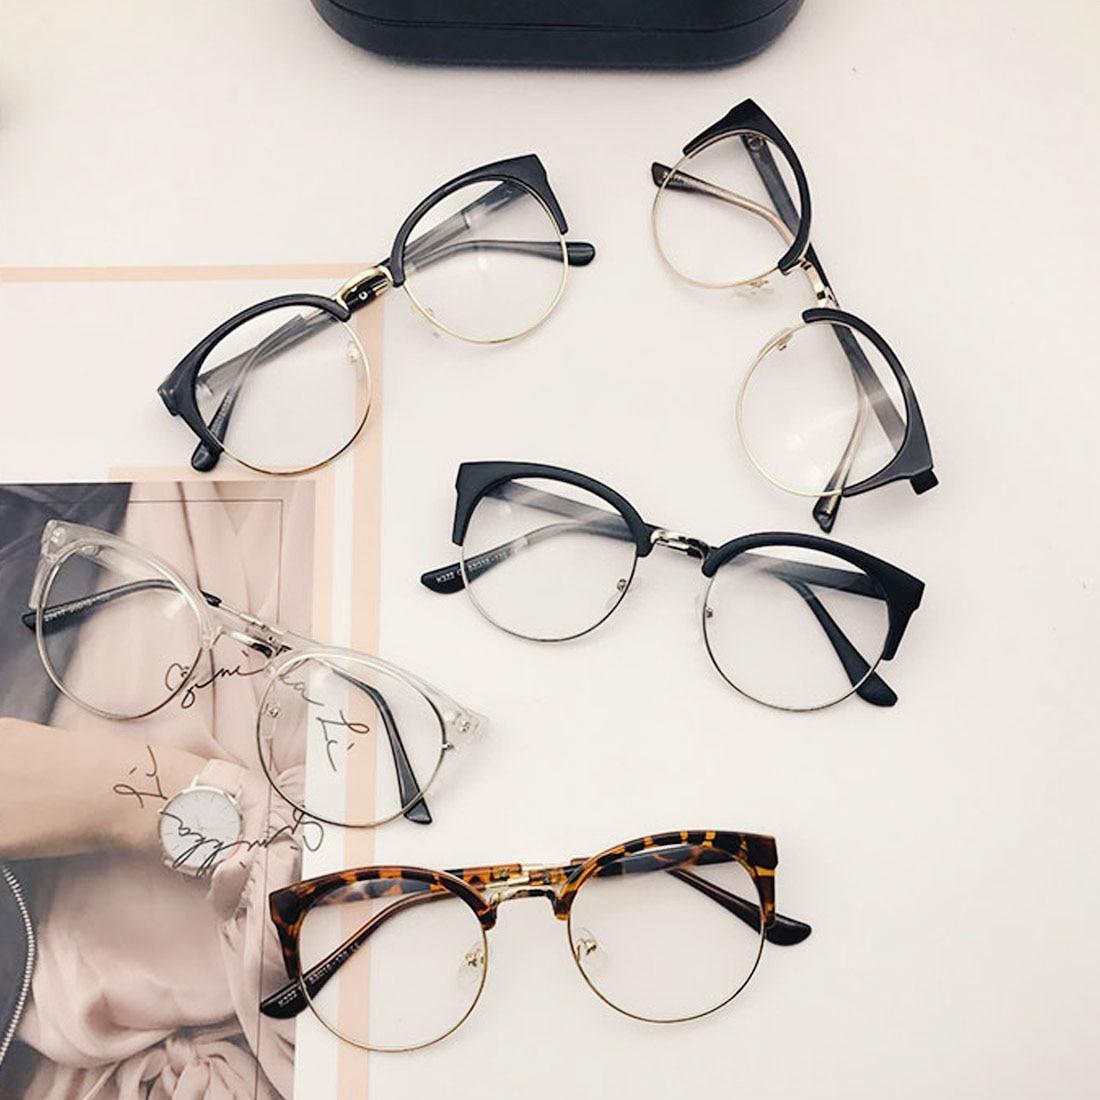 1PC Classic Retro Frames Glasses Clear Lens Nerd Designed Men Women Eyeglasses Vintage Half Metal Eyewear Frame Glasses